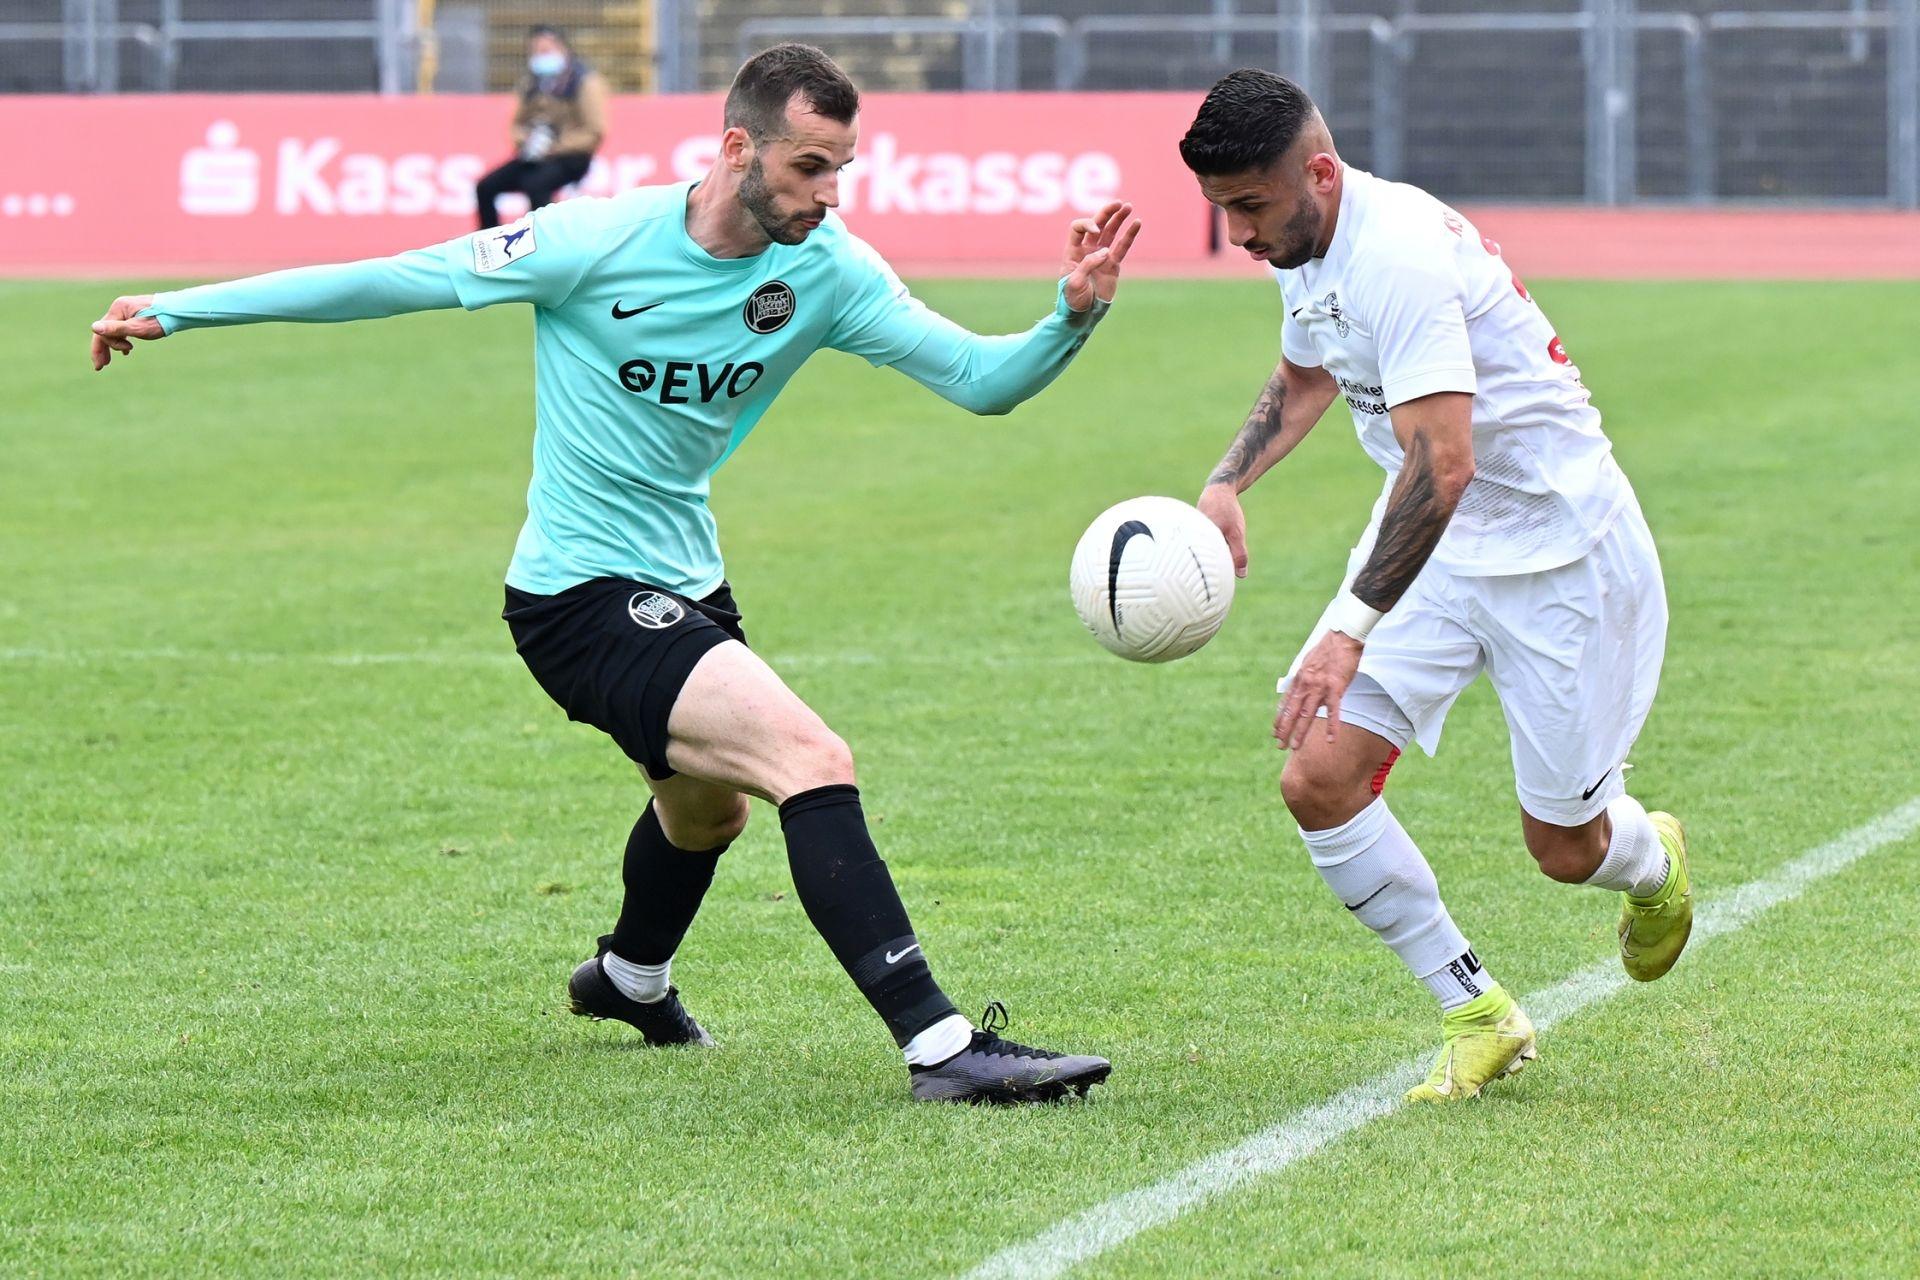 Regionalliga Südwest 2020/21, KSV Hessen Kassel, Kickers Offenbach, Endstand 0:4, Najjar